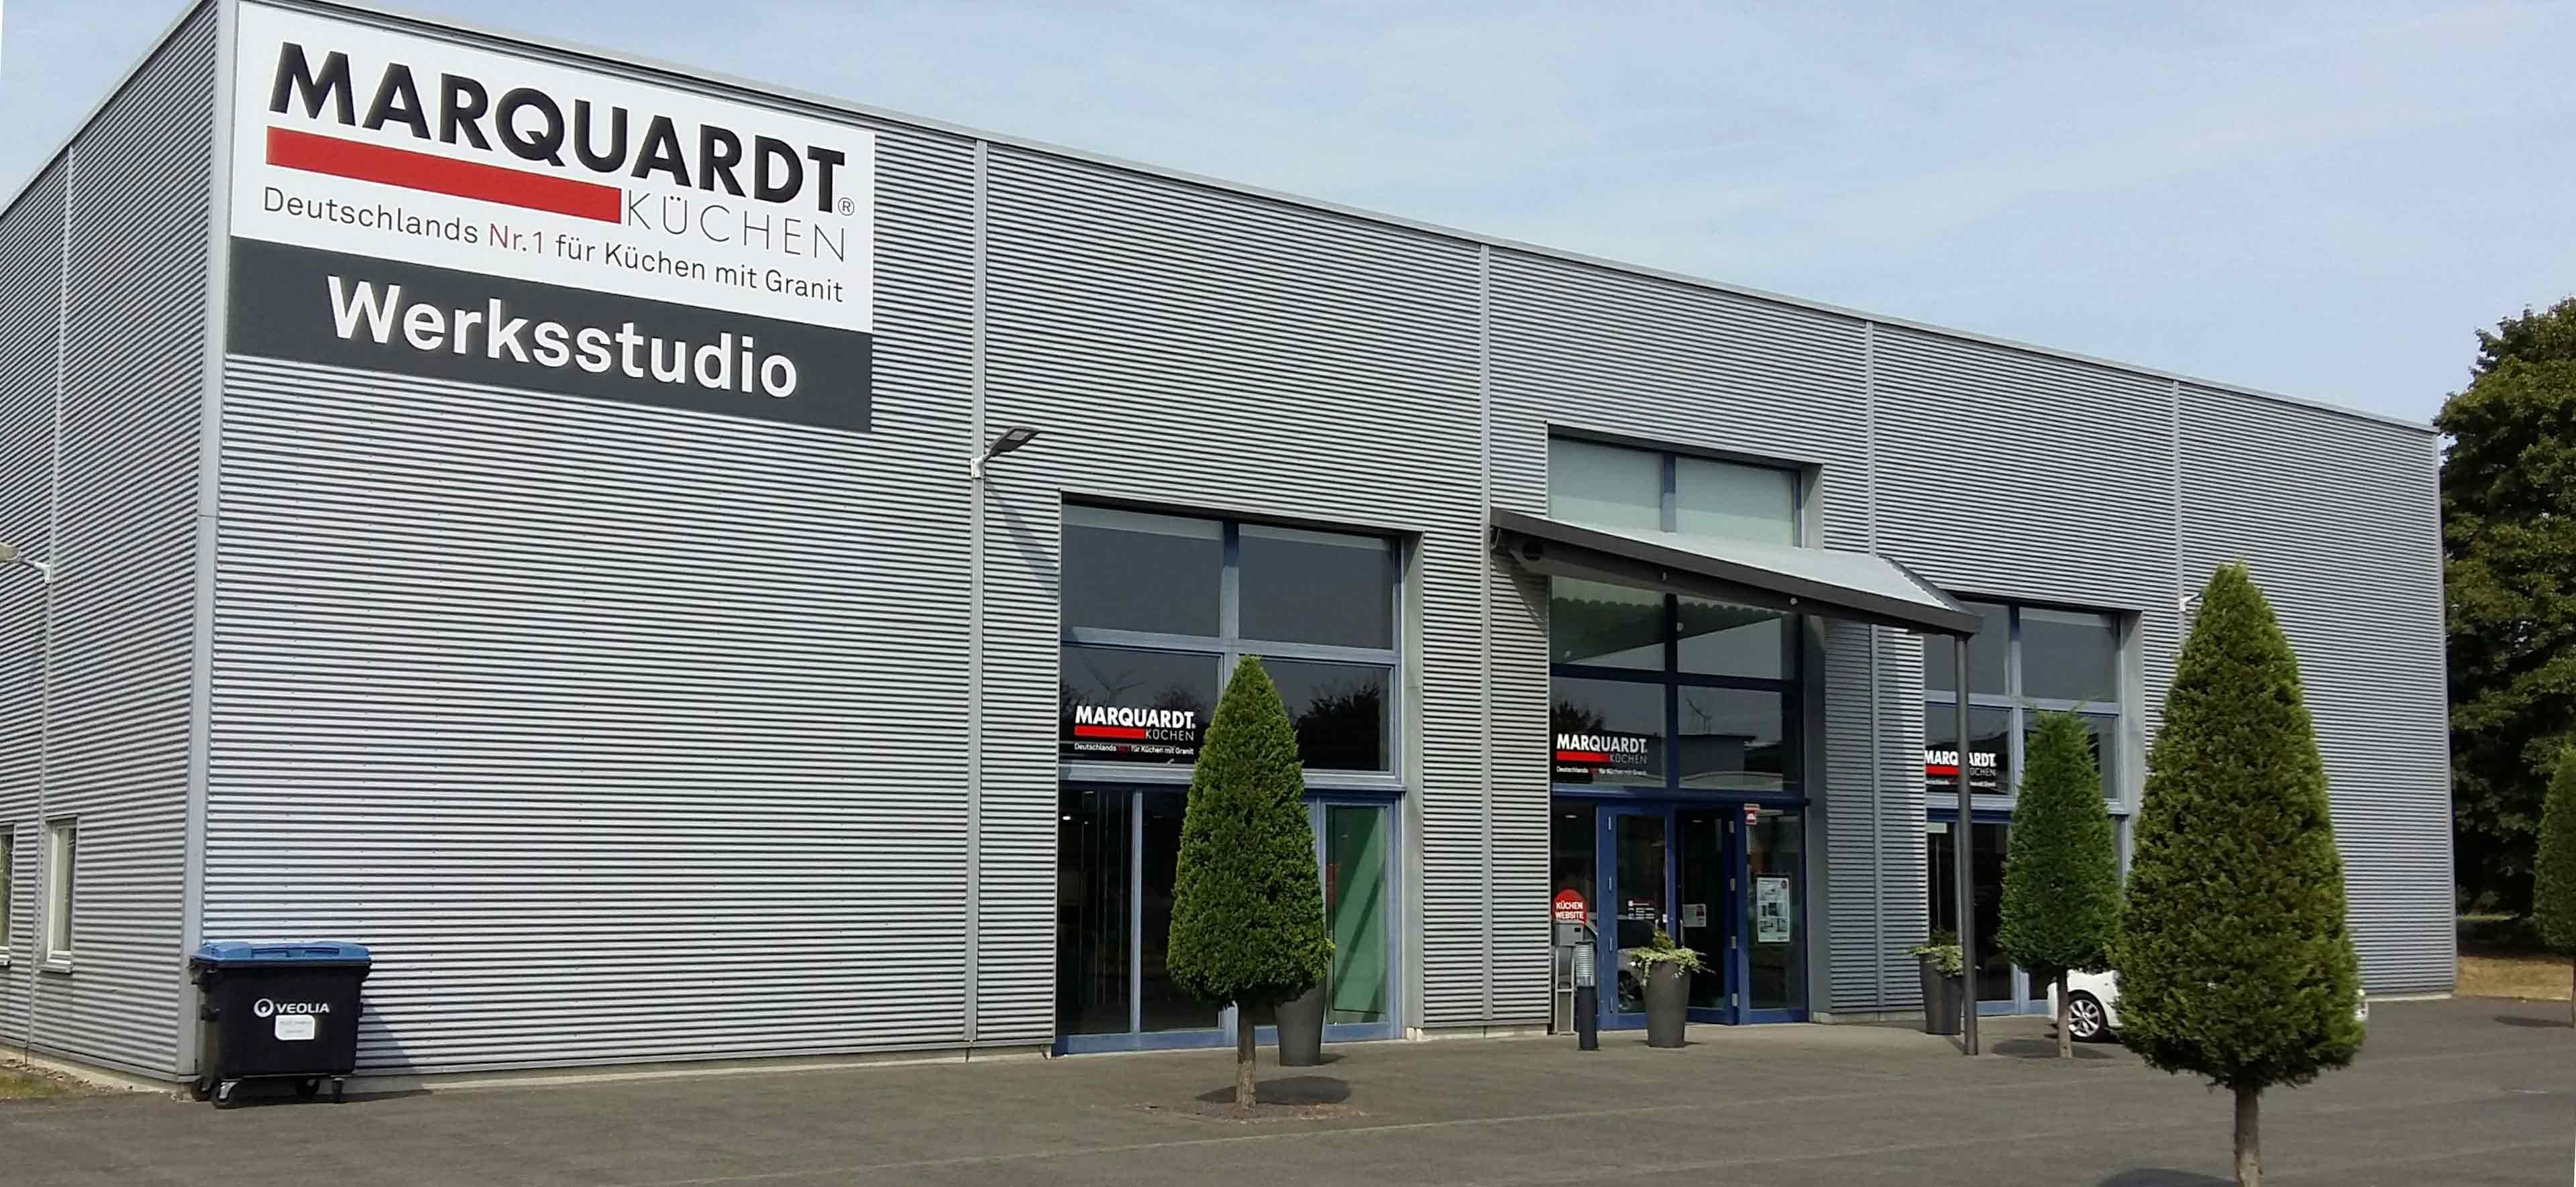 Kuchenstudio Paderborn Marquardt Kuchen